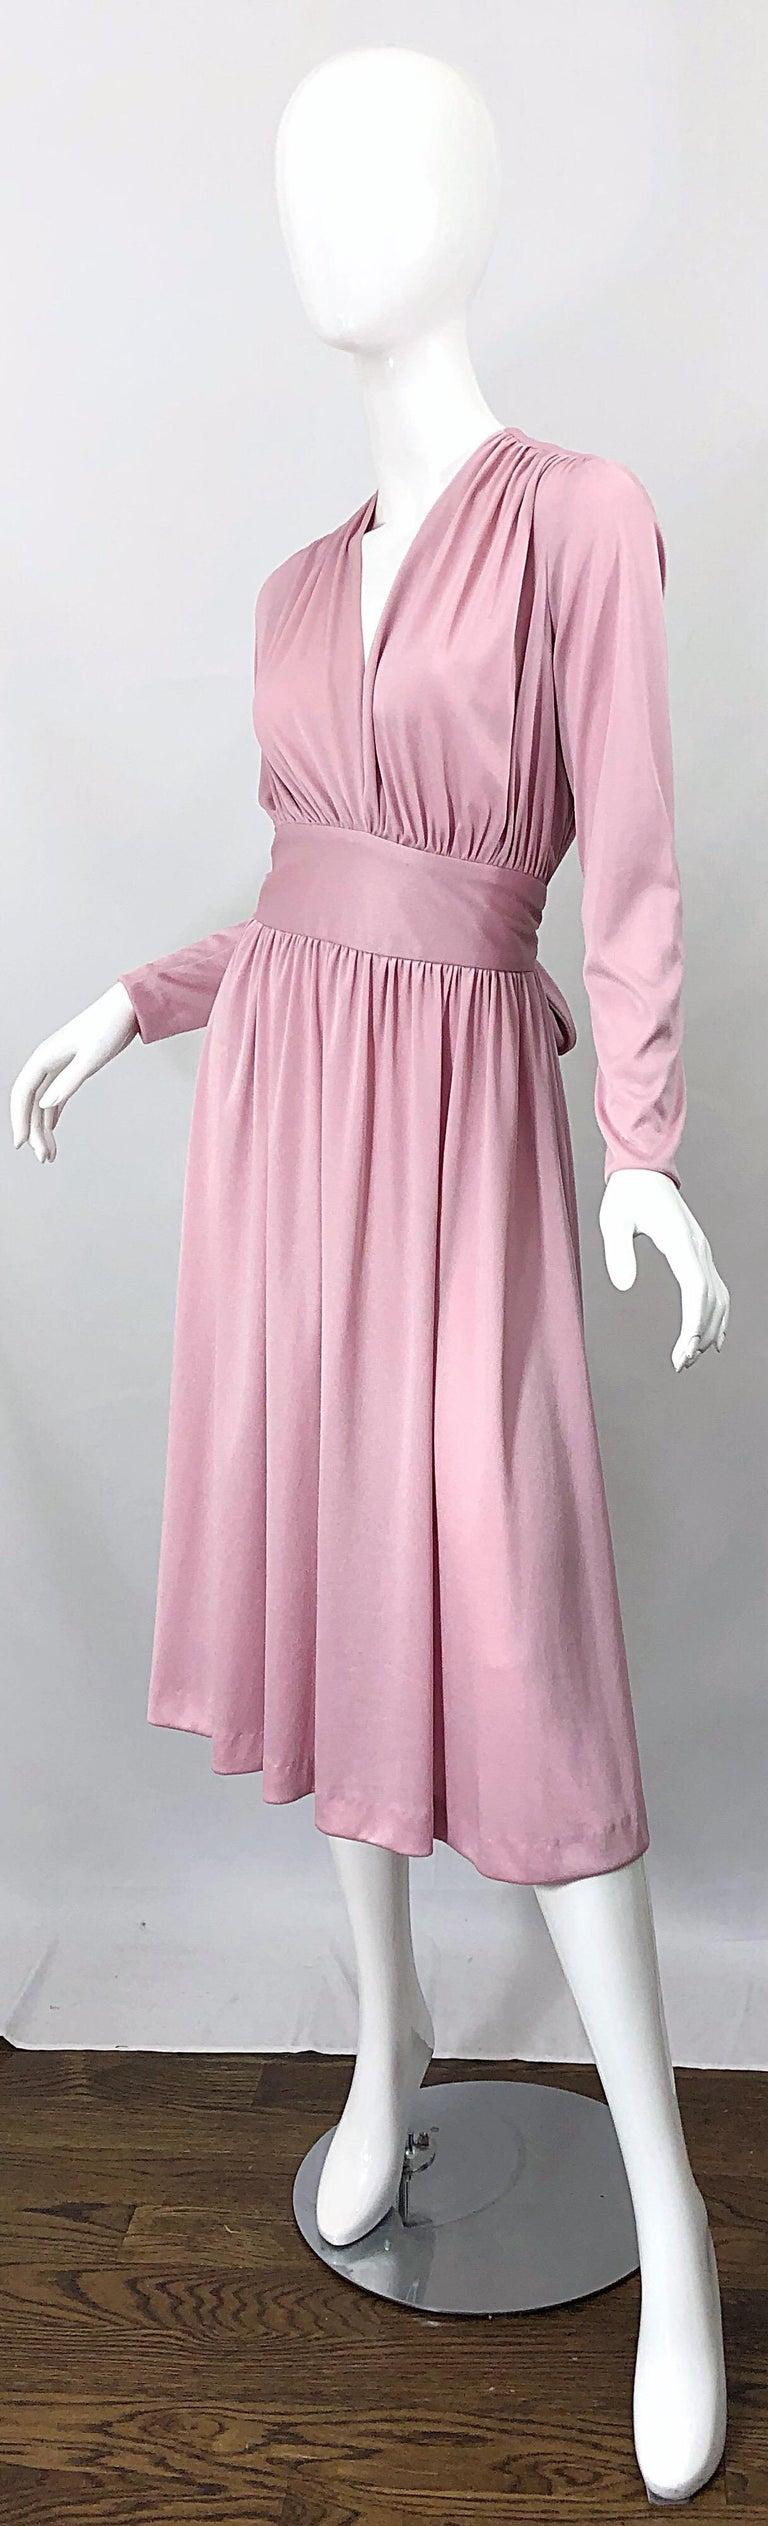 Women's Joy Stevens 1970s Pink Mauve Dusty Rose Long Sleeve Disco Vintage 70s Dress For Sale